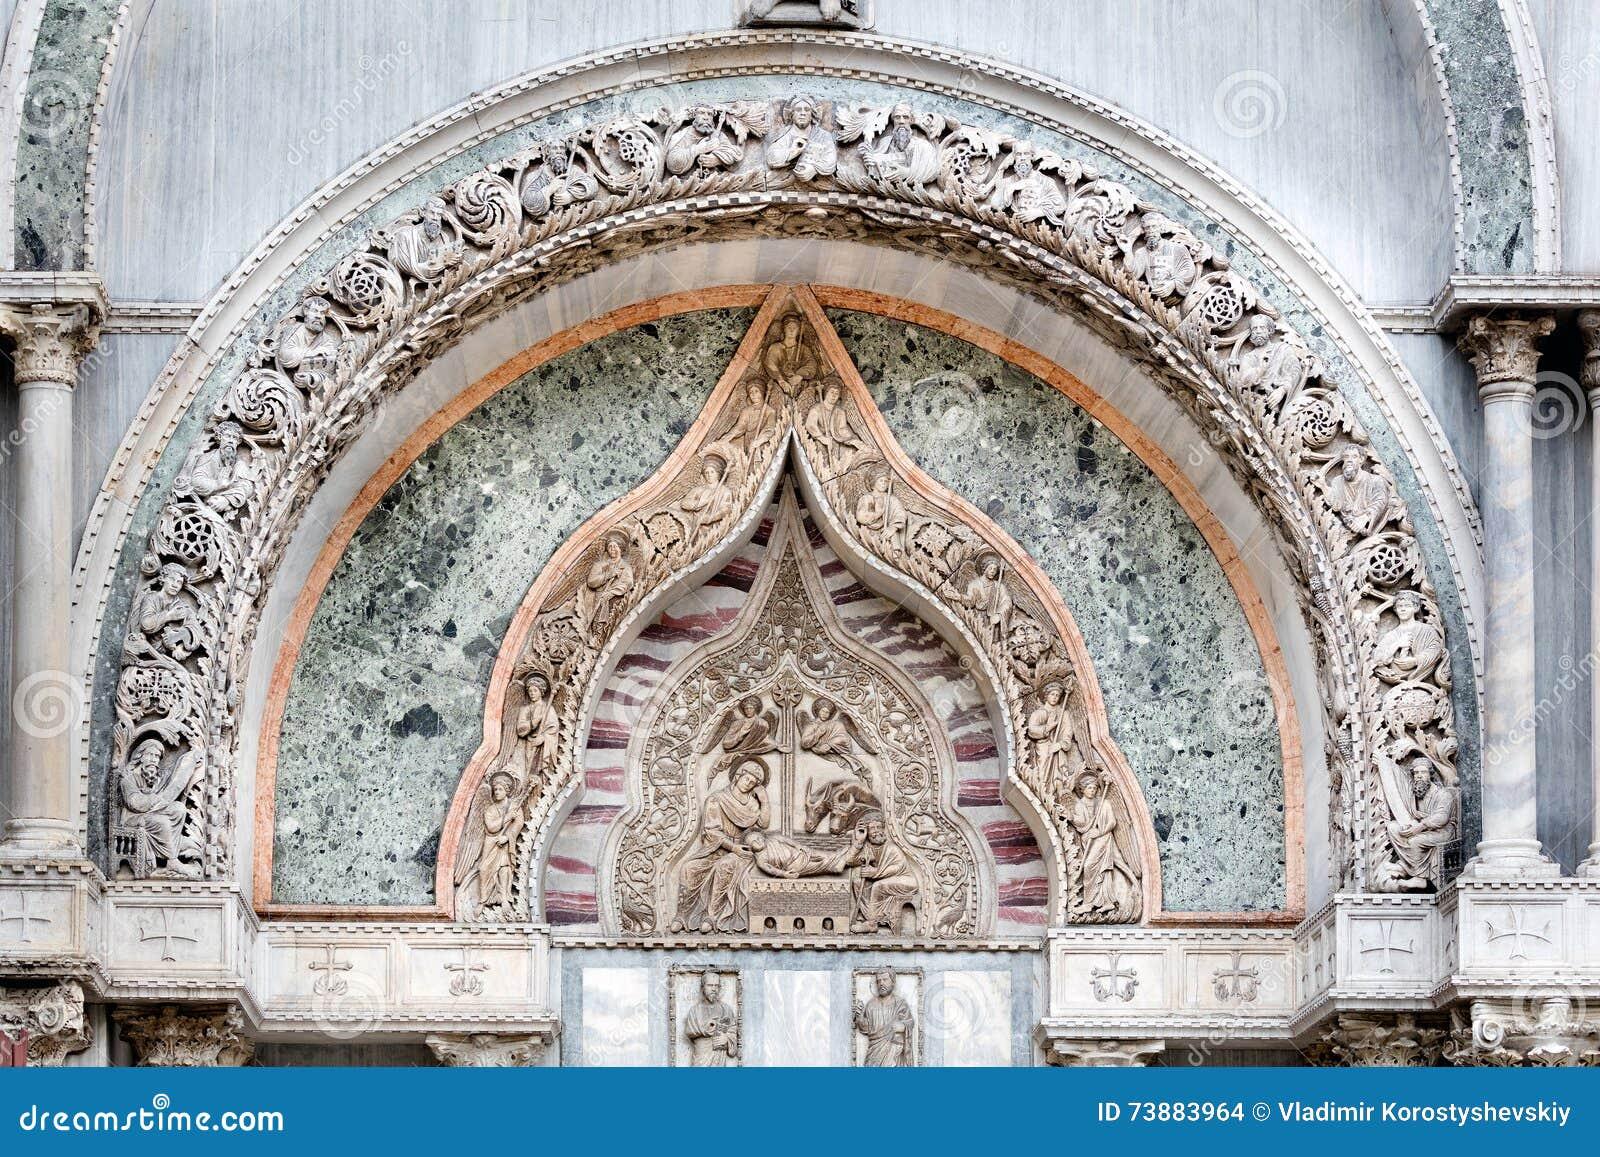 Venetian Gothic medieval venetian gothic ornaments on the san marco basilica fac